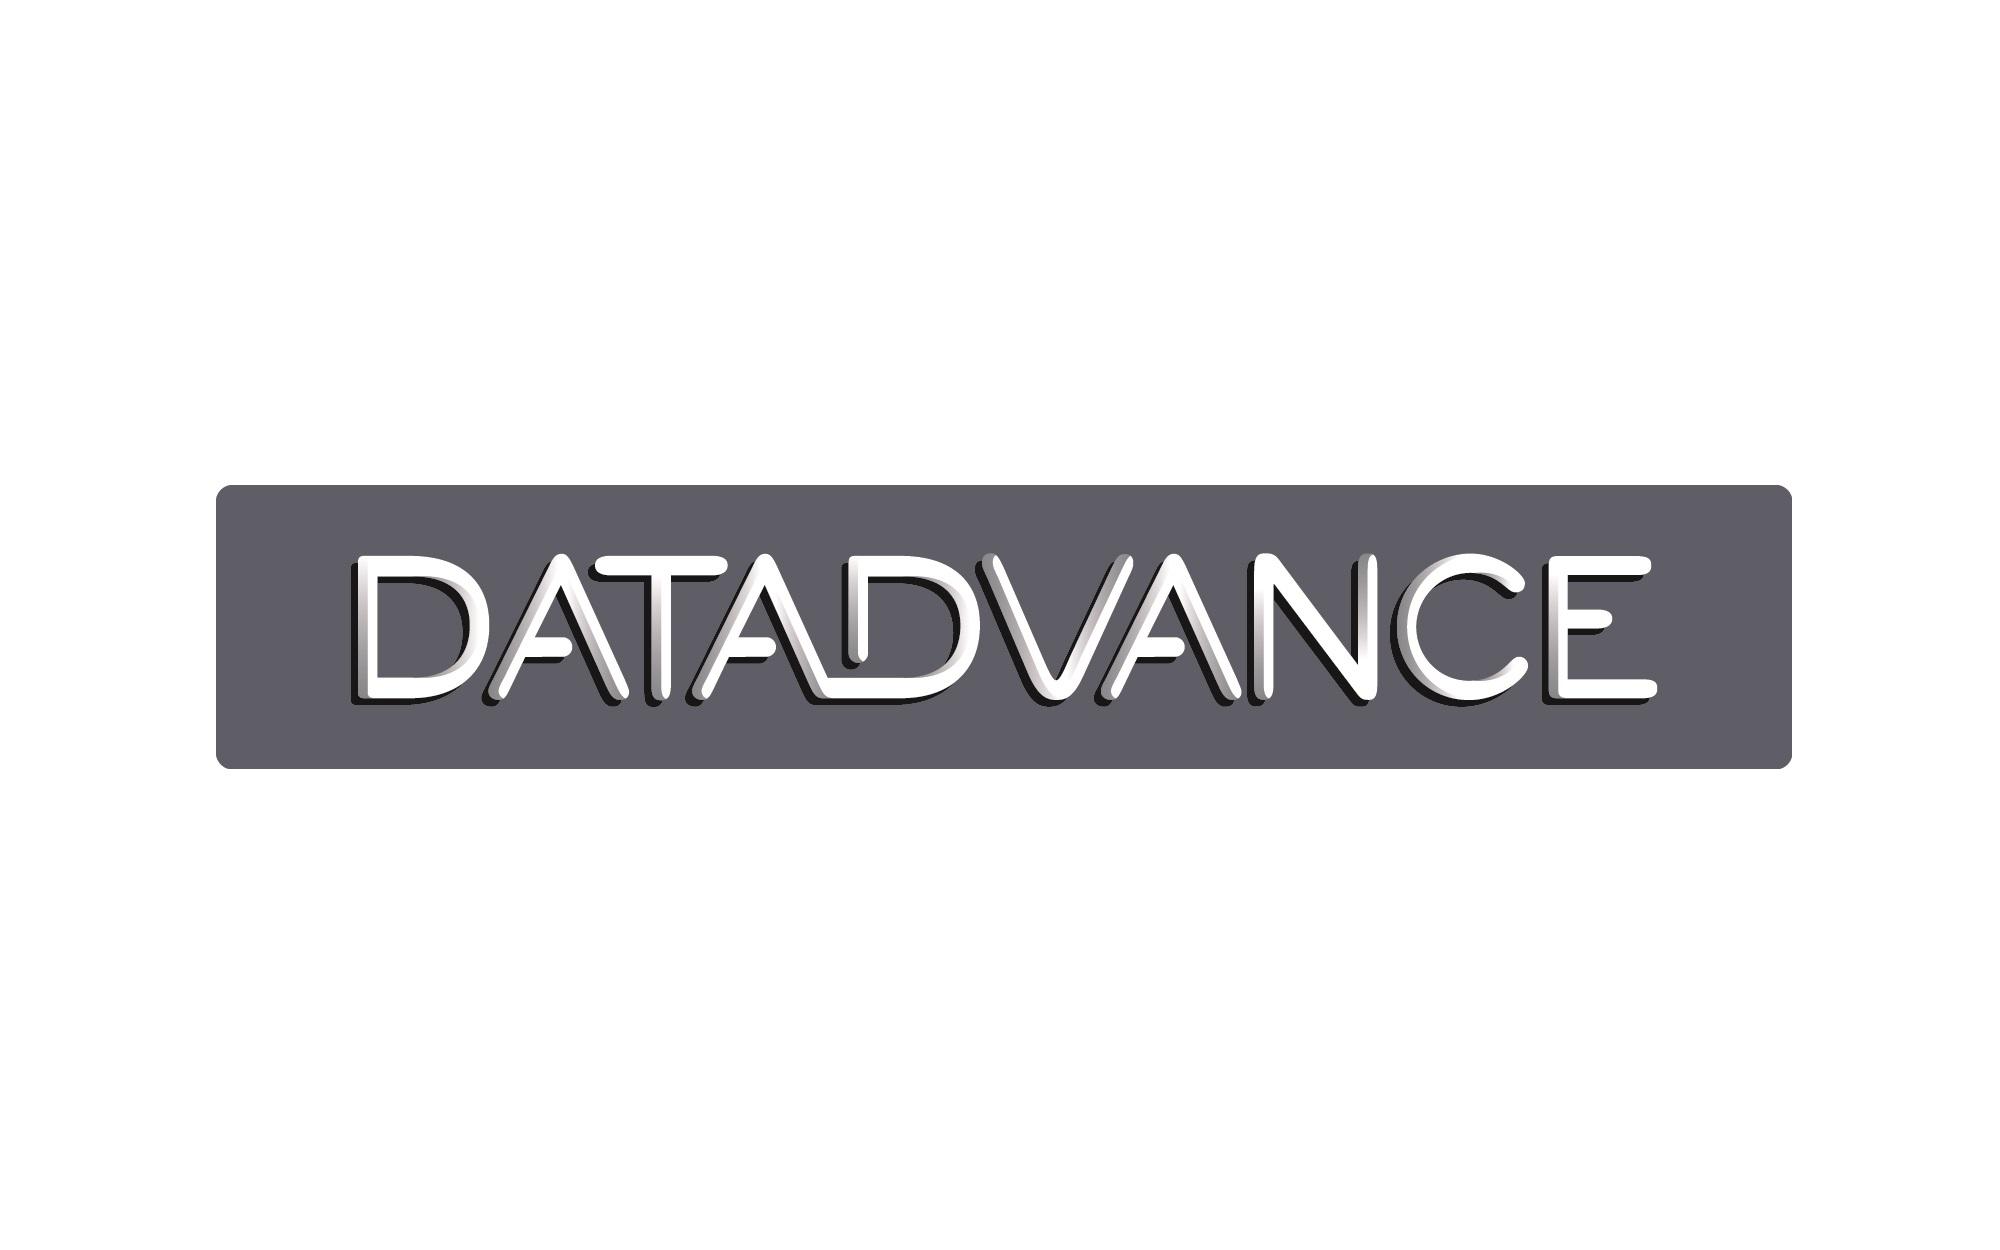 datadvance2